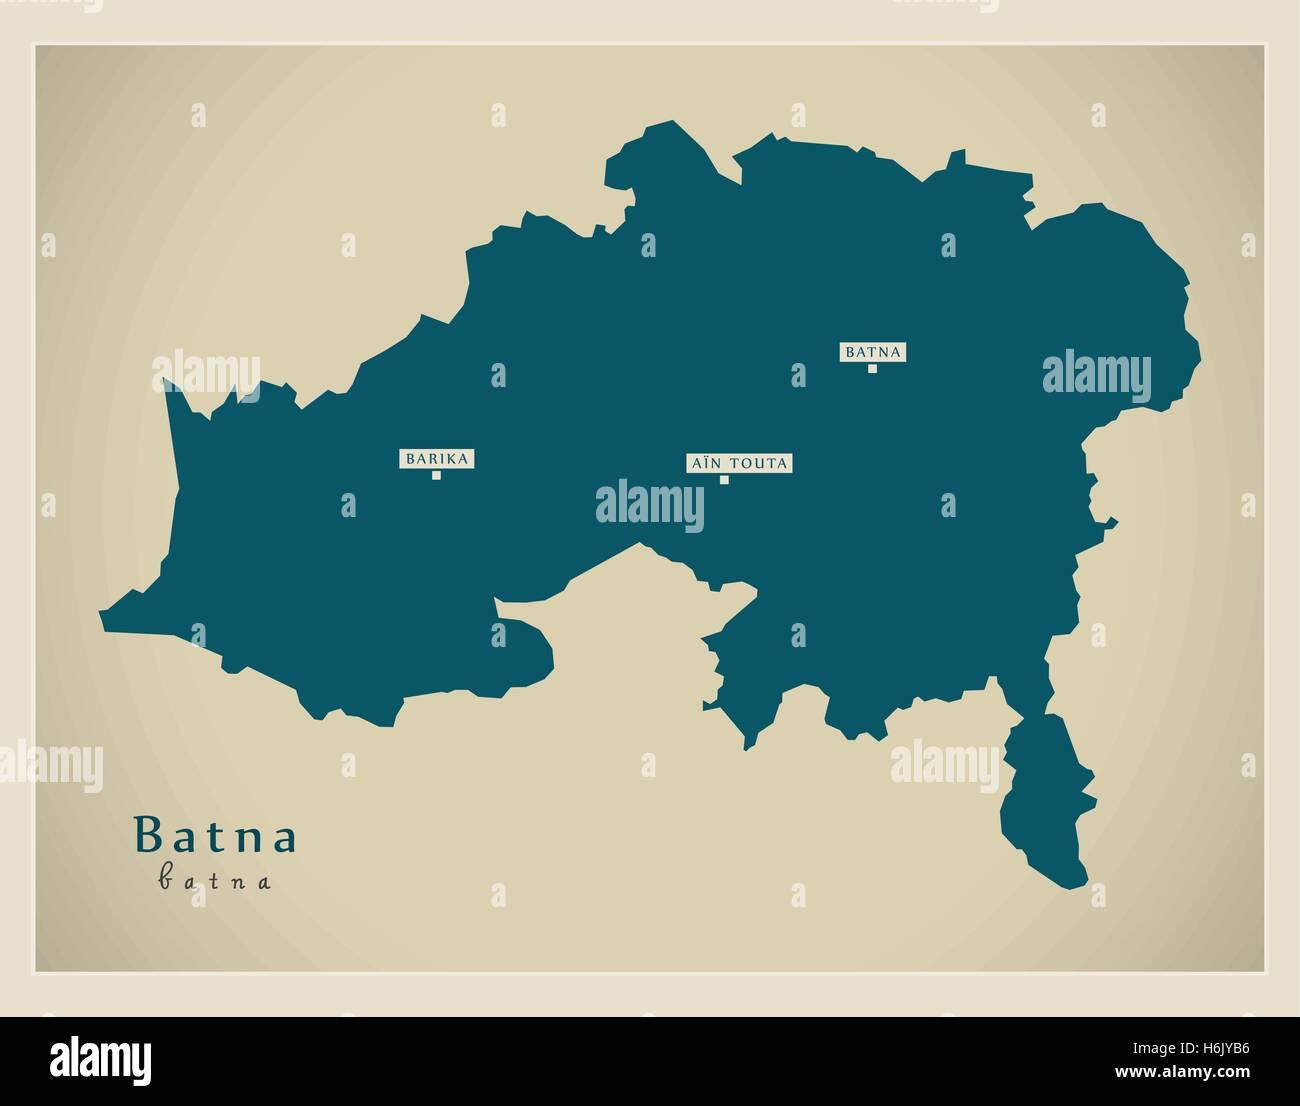 Modern Map - Batna BZ Stock Vector Art & Illustration, Vector Image ...